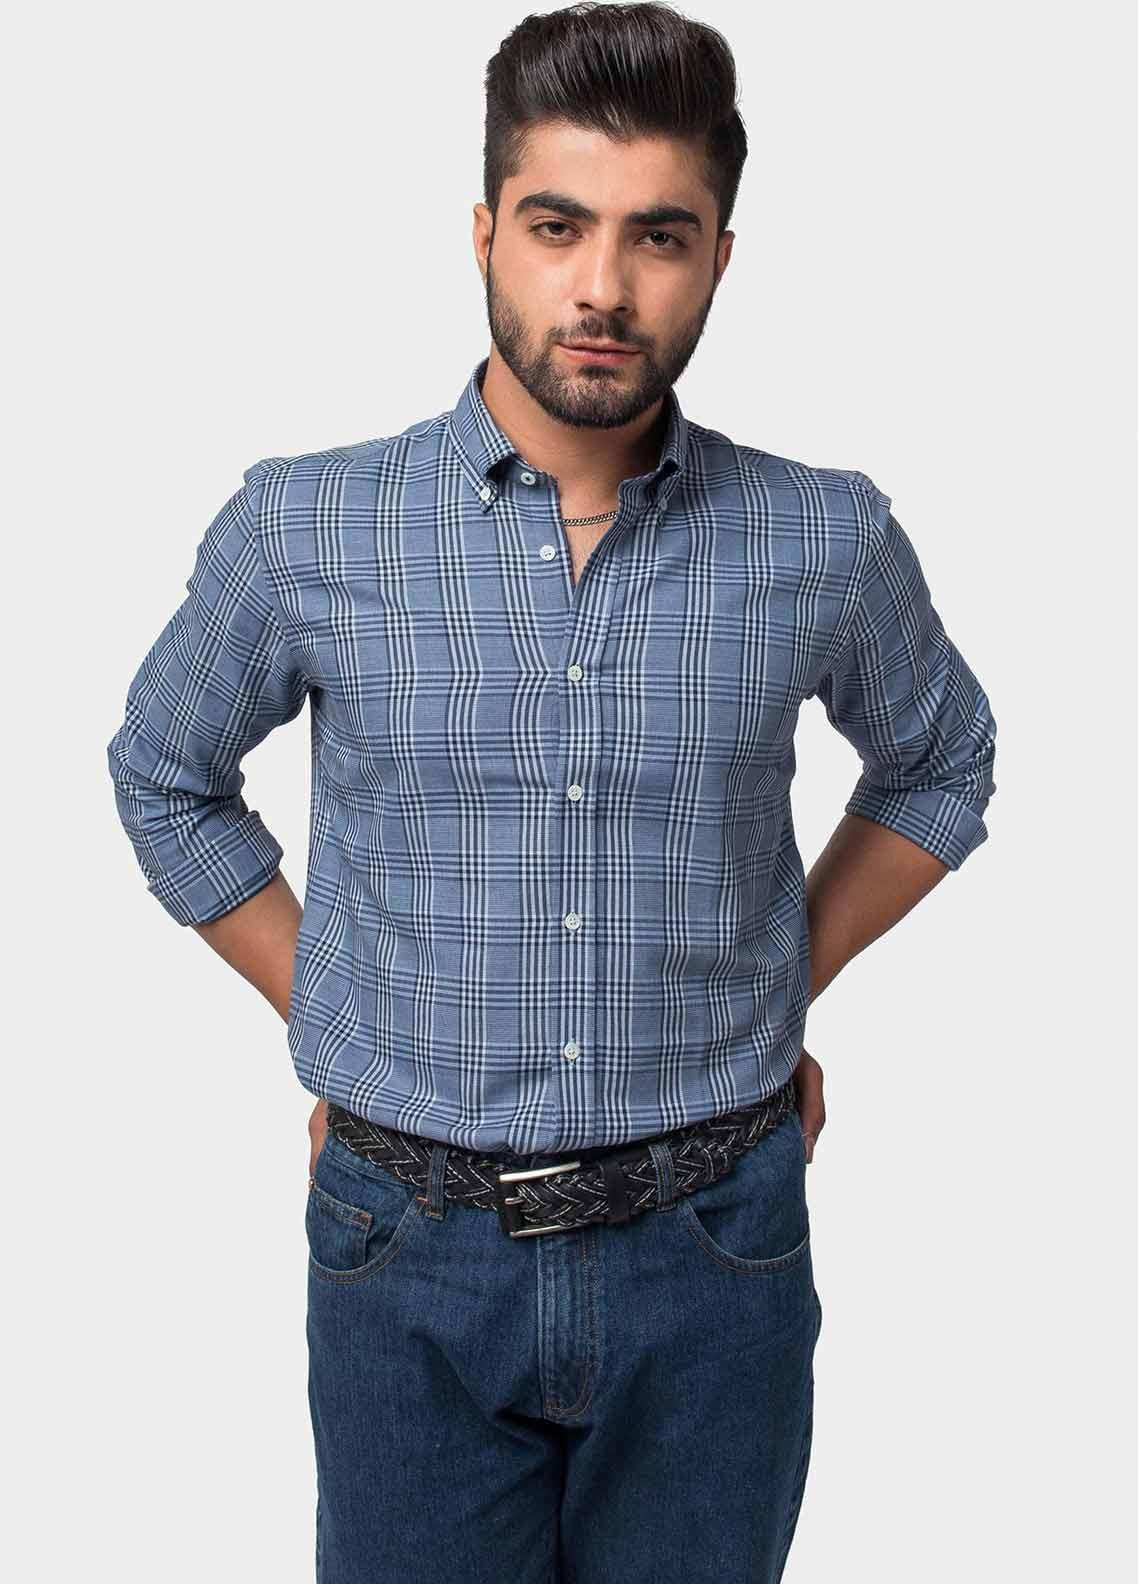 Brumano Cotton Formal Men Shirts -  BM20LS Blue Shepherd Checkered Shirt